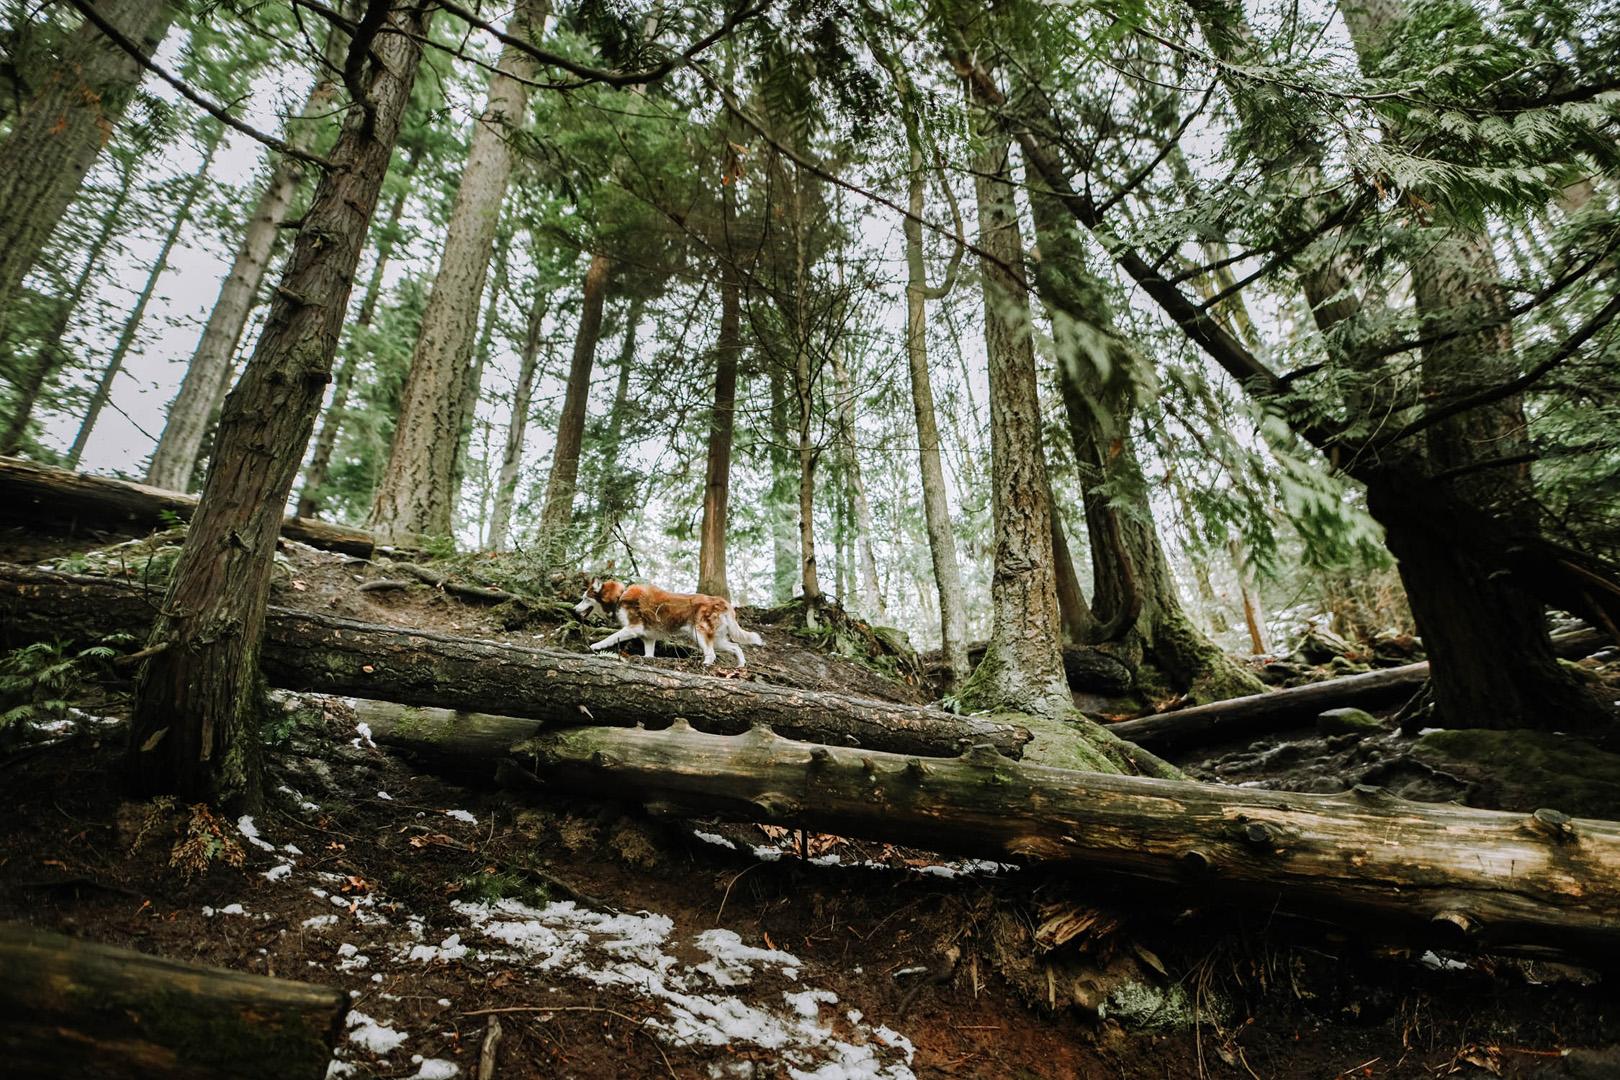 Airstream Travel Adventures Dog in Woods